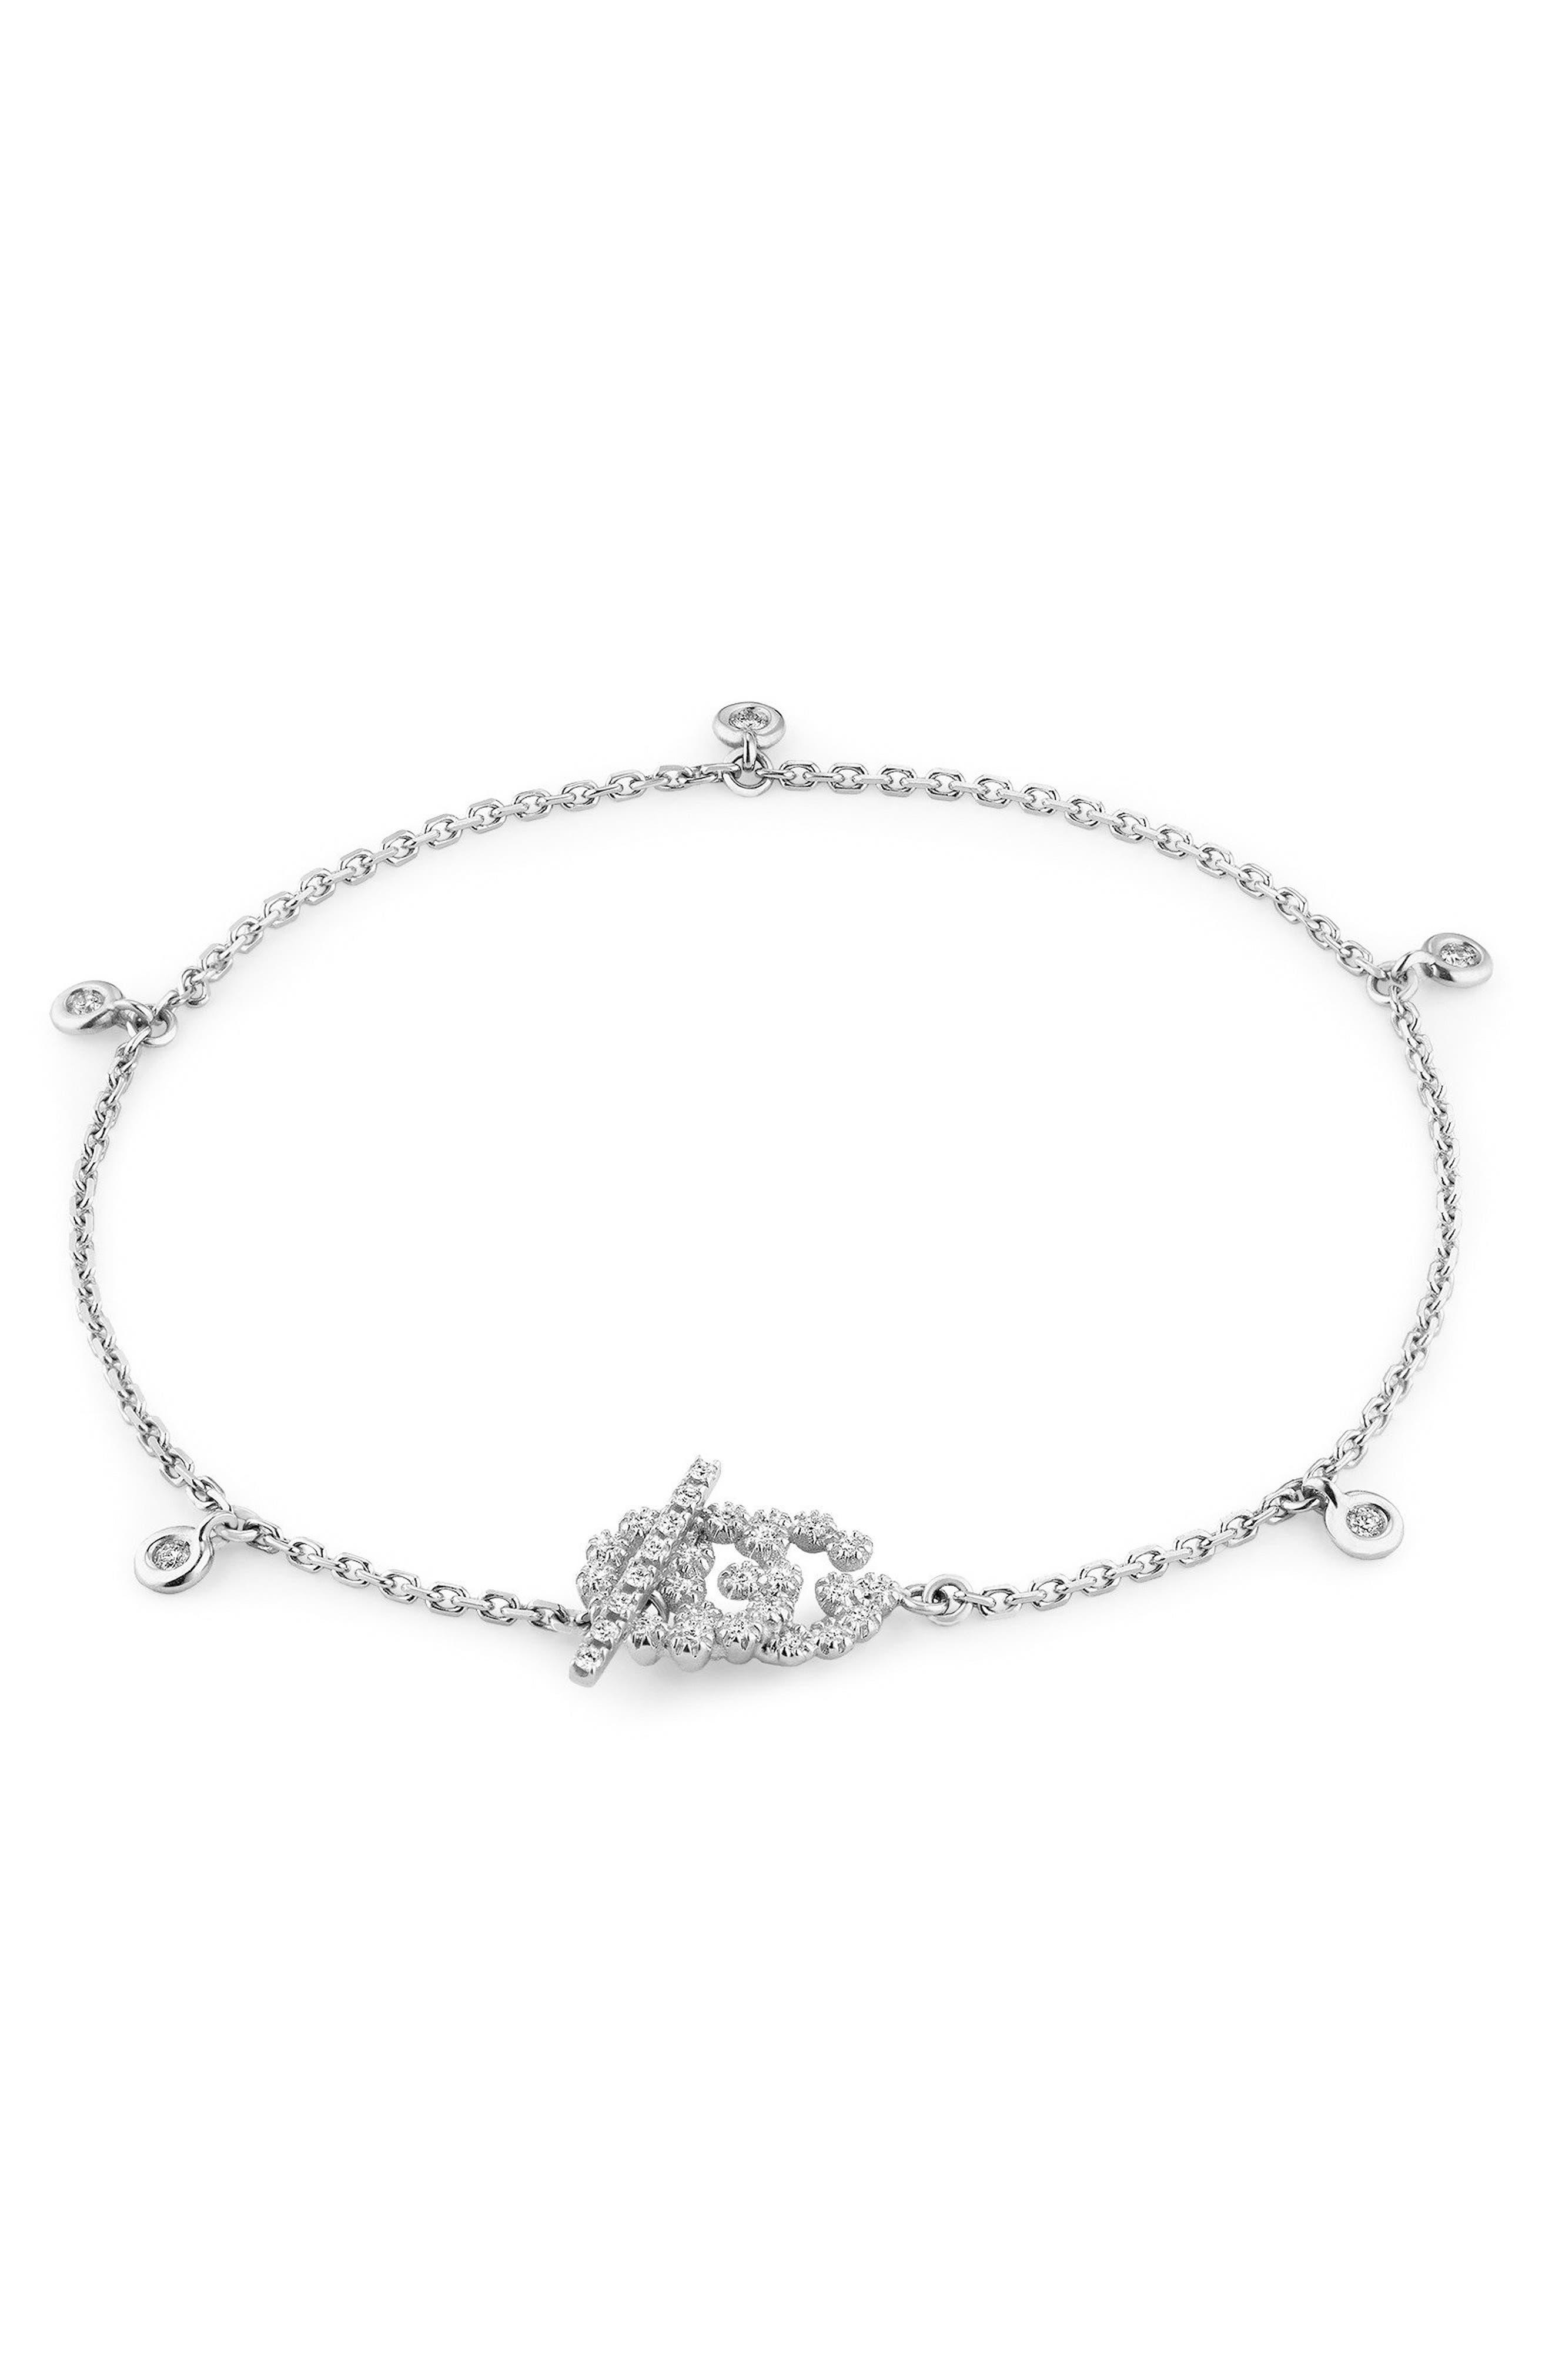 Double-G Diamond Line Bracelet,                             Main thumbnail 1, color,                             WHITE GOLD